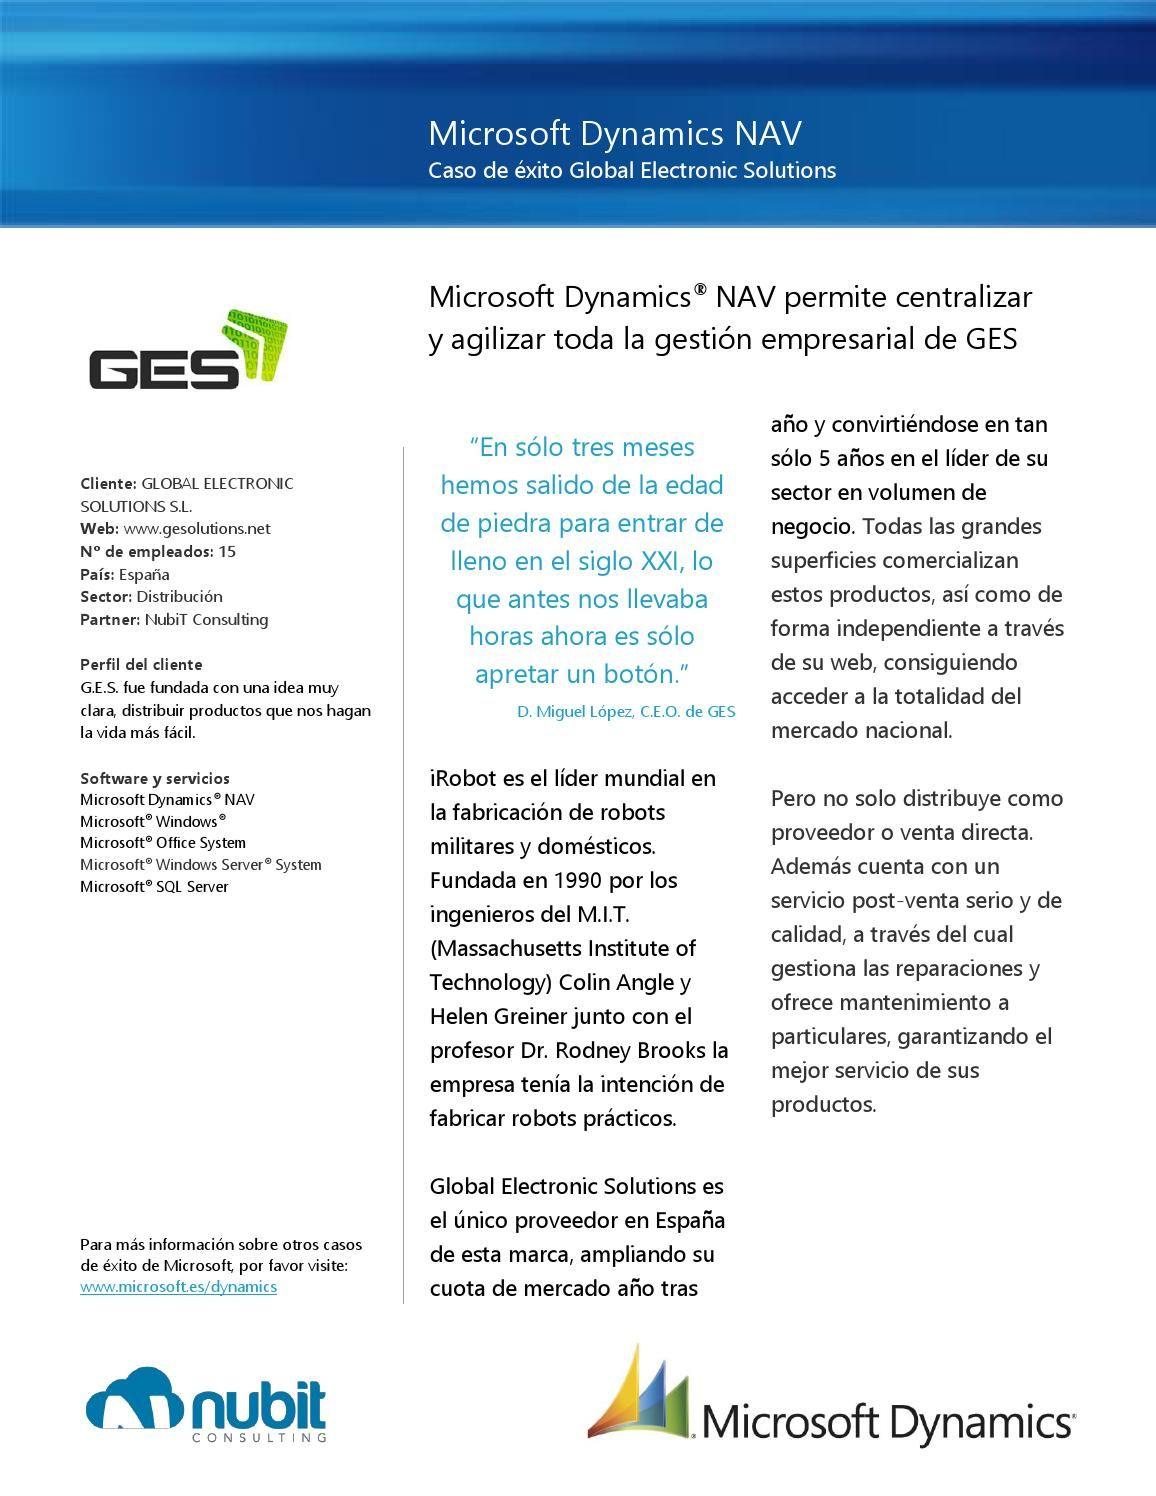 Caso de éxito de implantación de Dynamisc NAV la empresa GES, única filial española de la multinacional iRobot, dentro del sector de la robótica doméstica